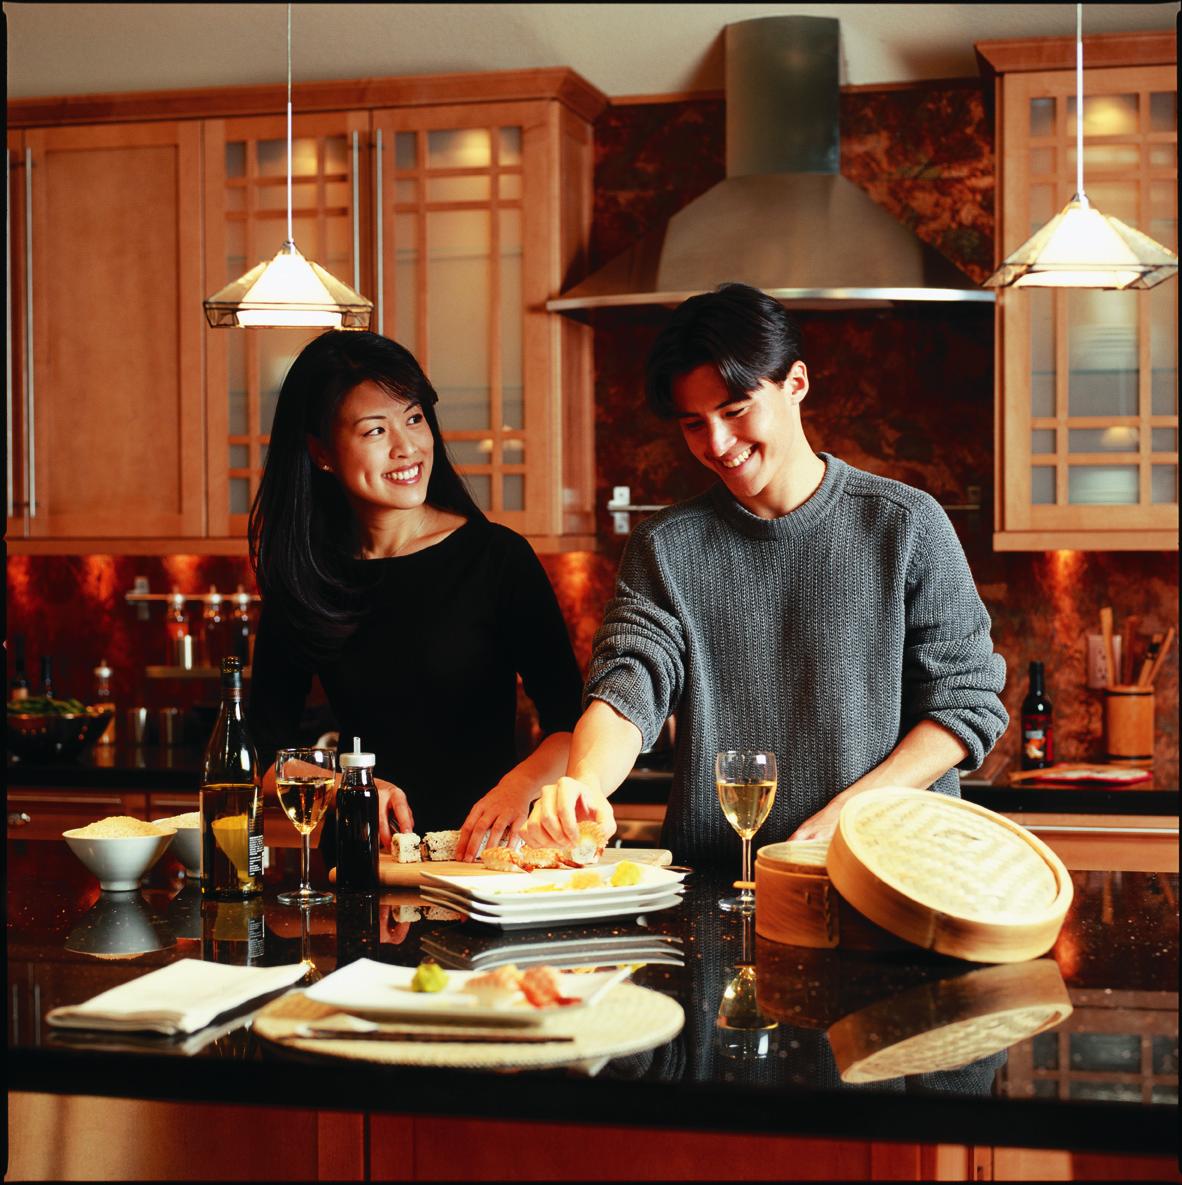 shaker-kitchen-ls-rt-.jpg